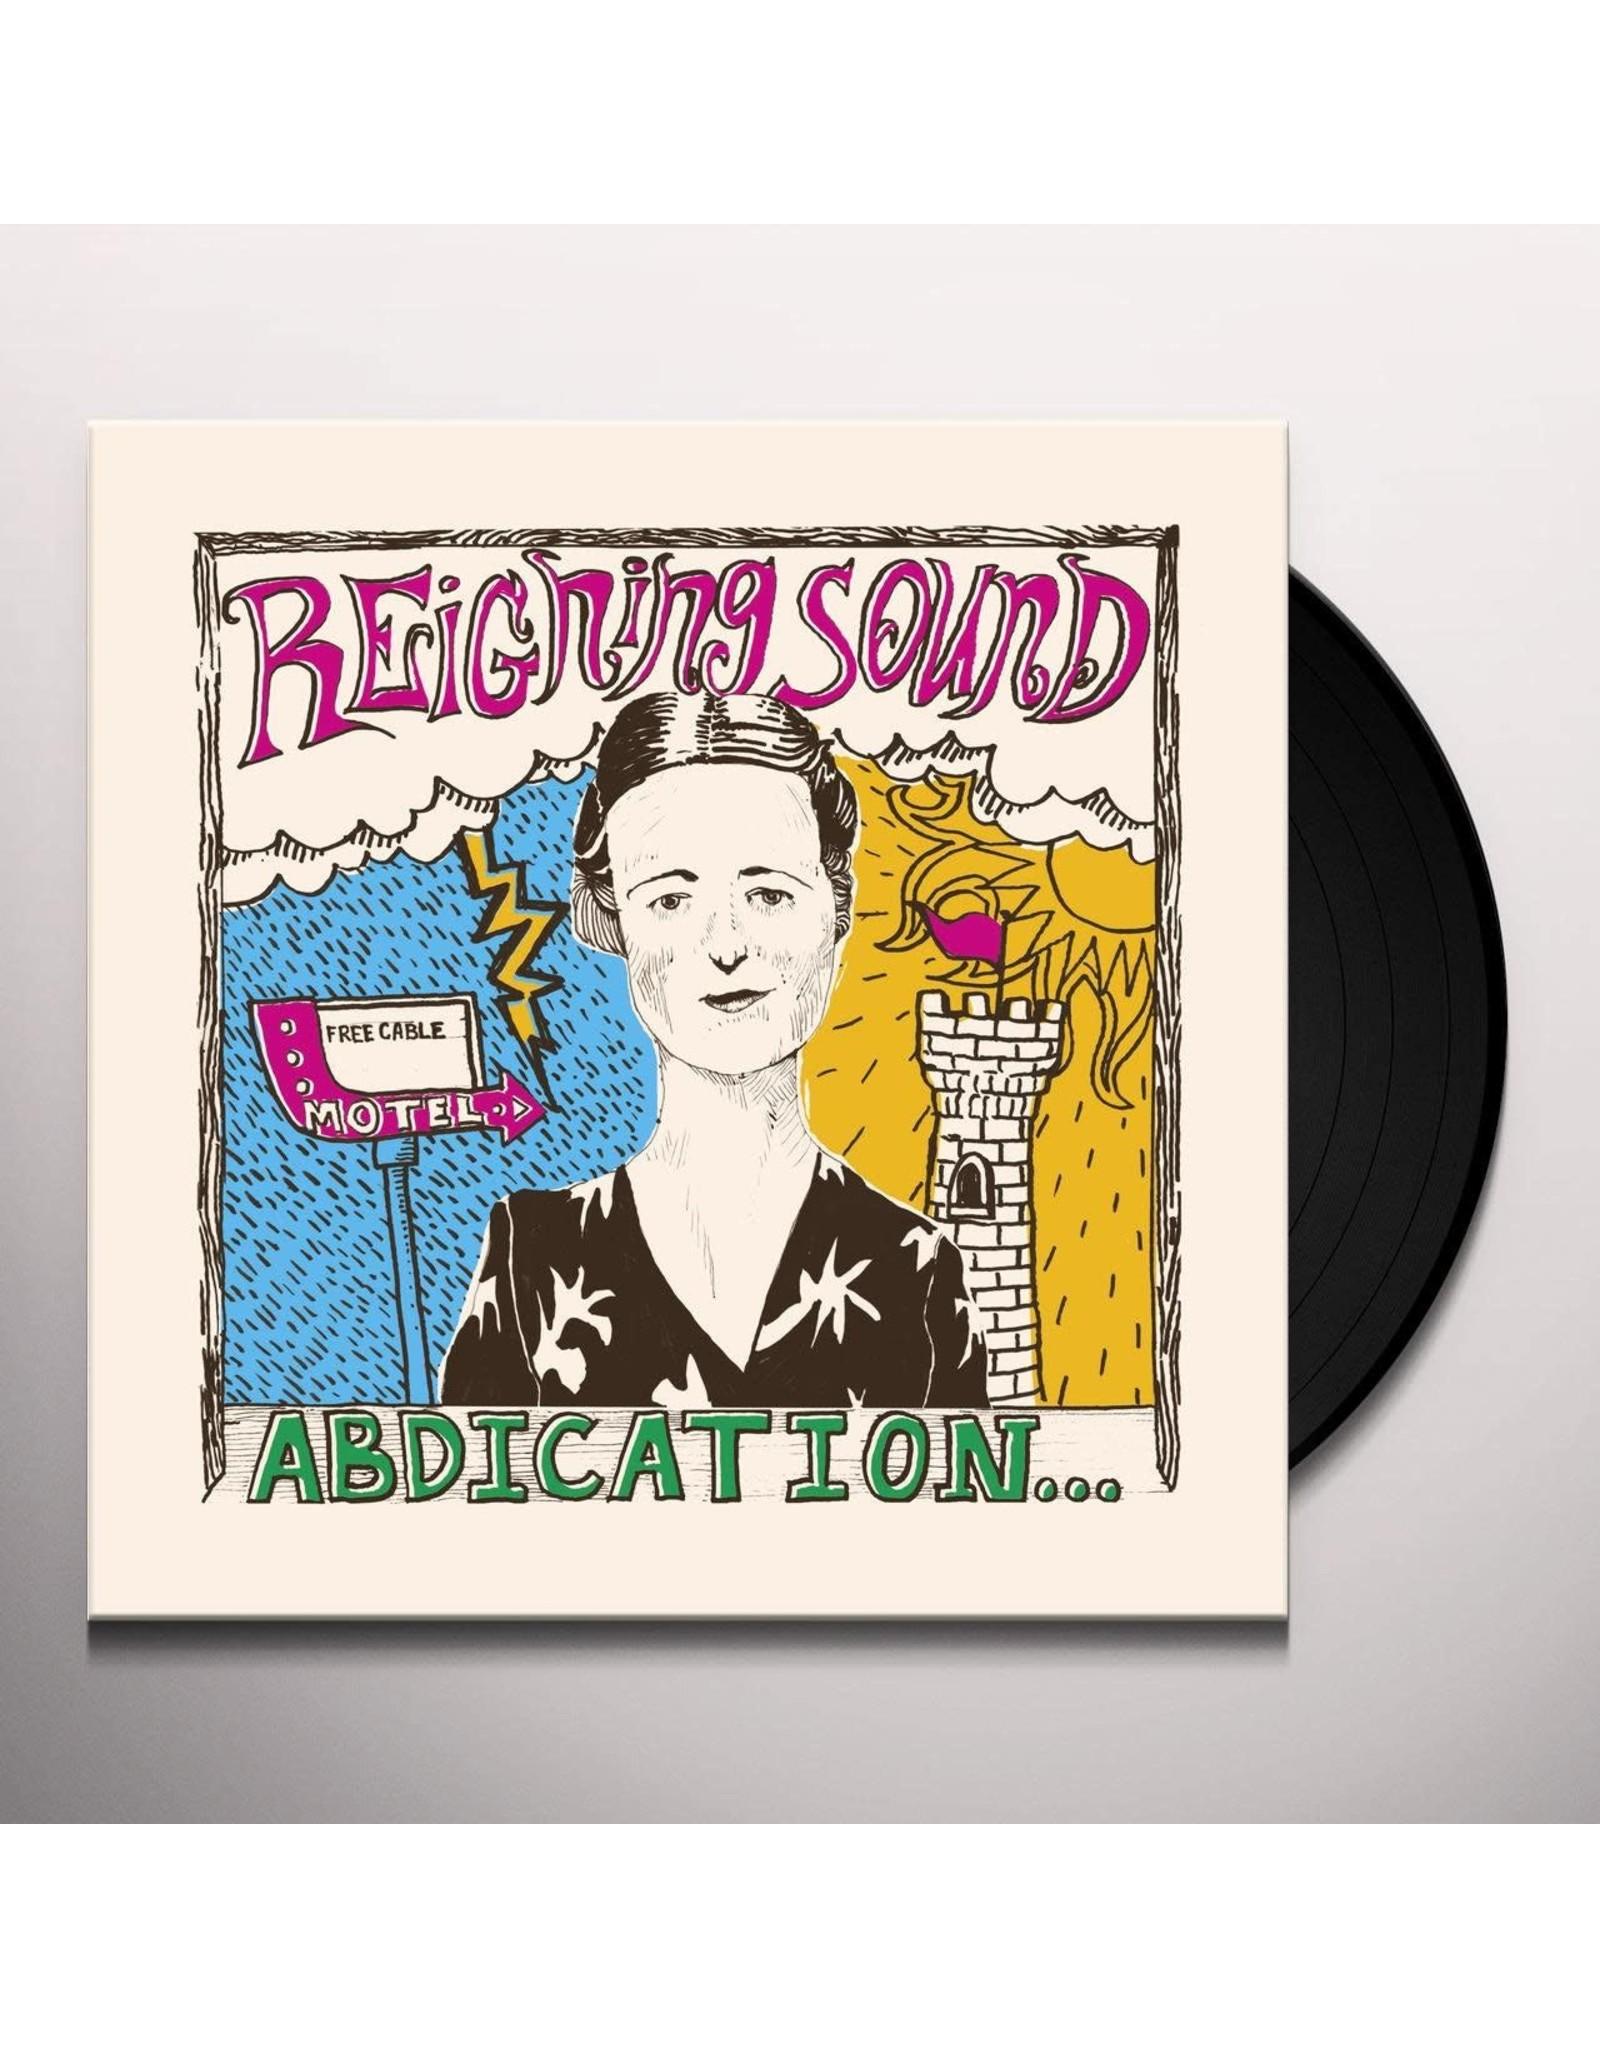 Reigning Sound - Abdication (Ltd. Red) LP